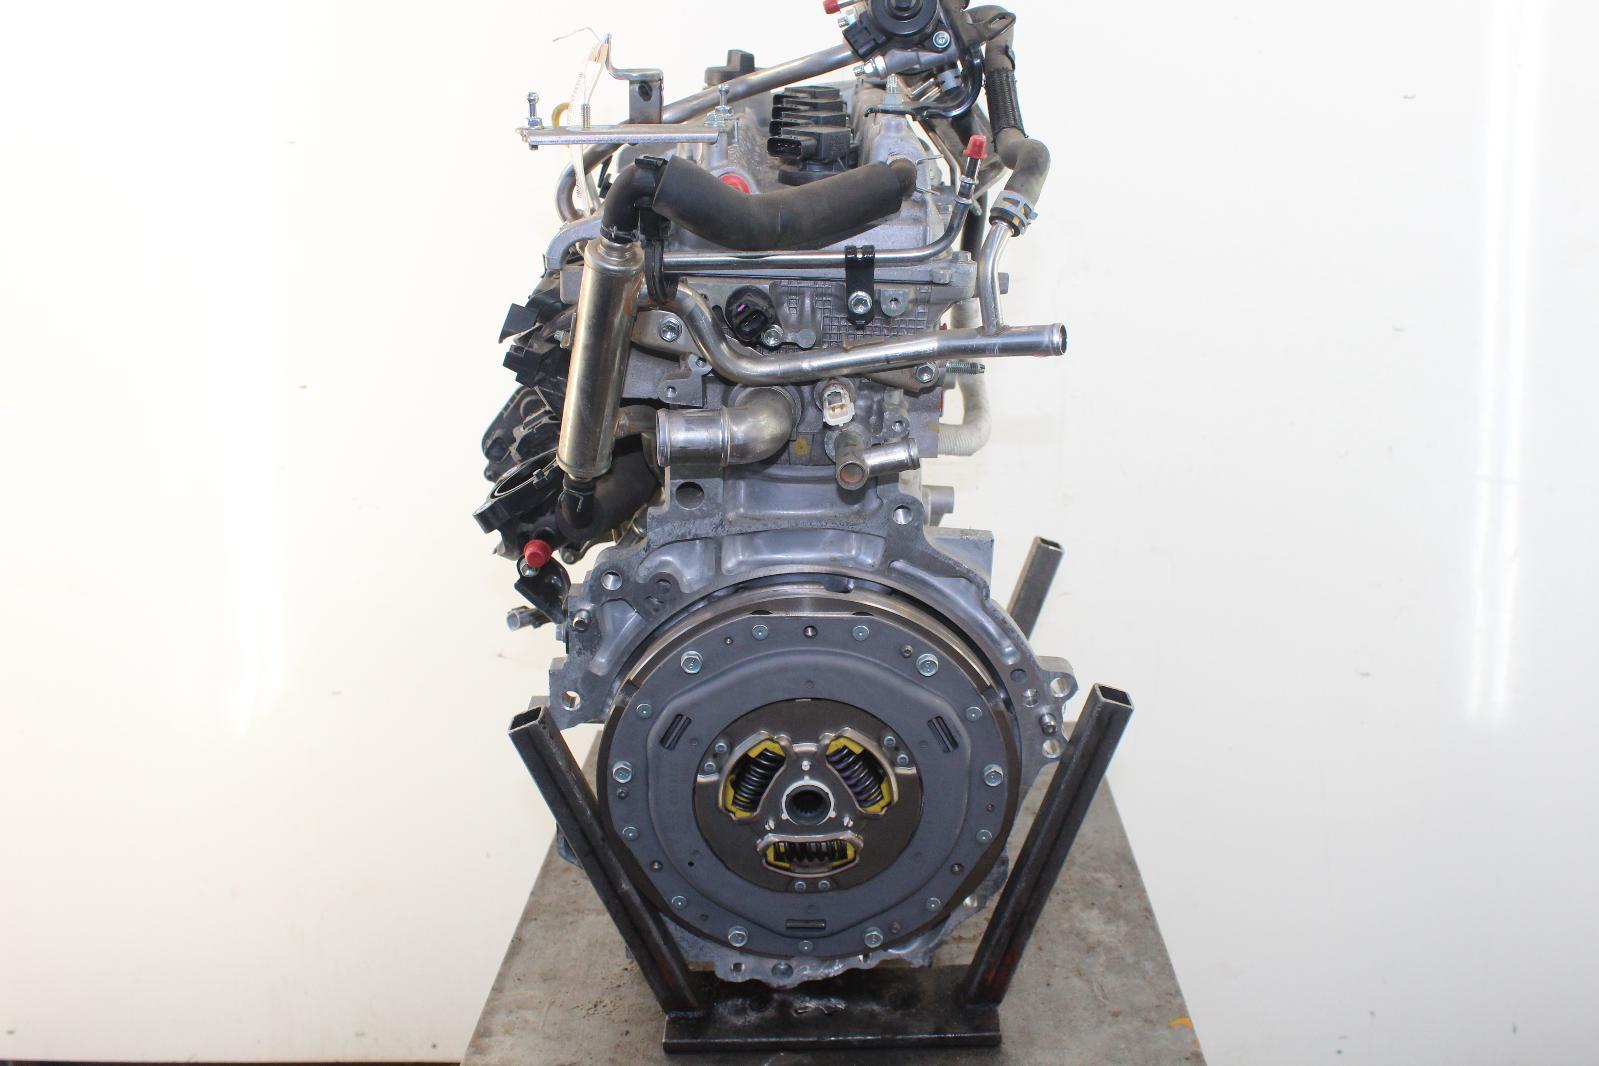 Toyota 1nz fxe engine manual